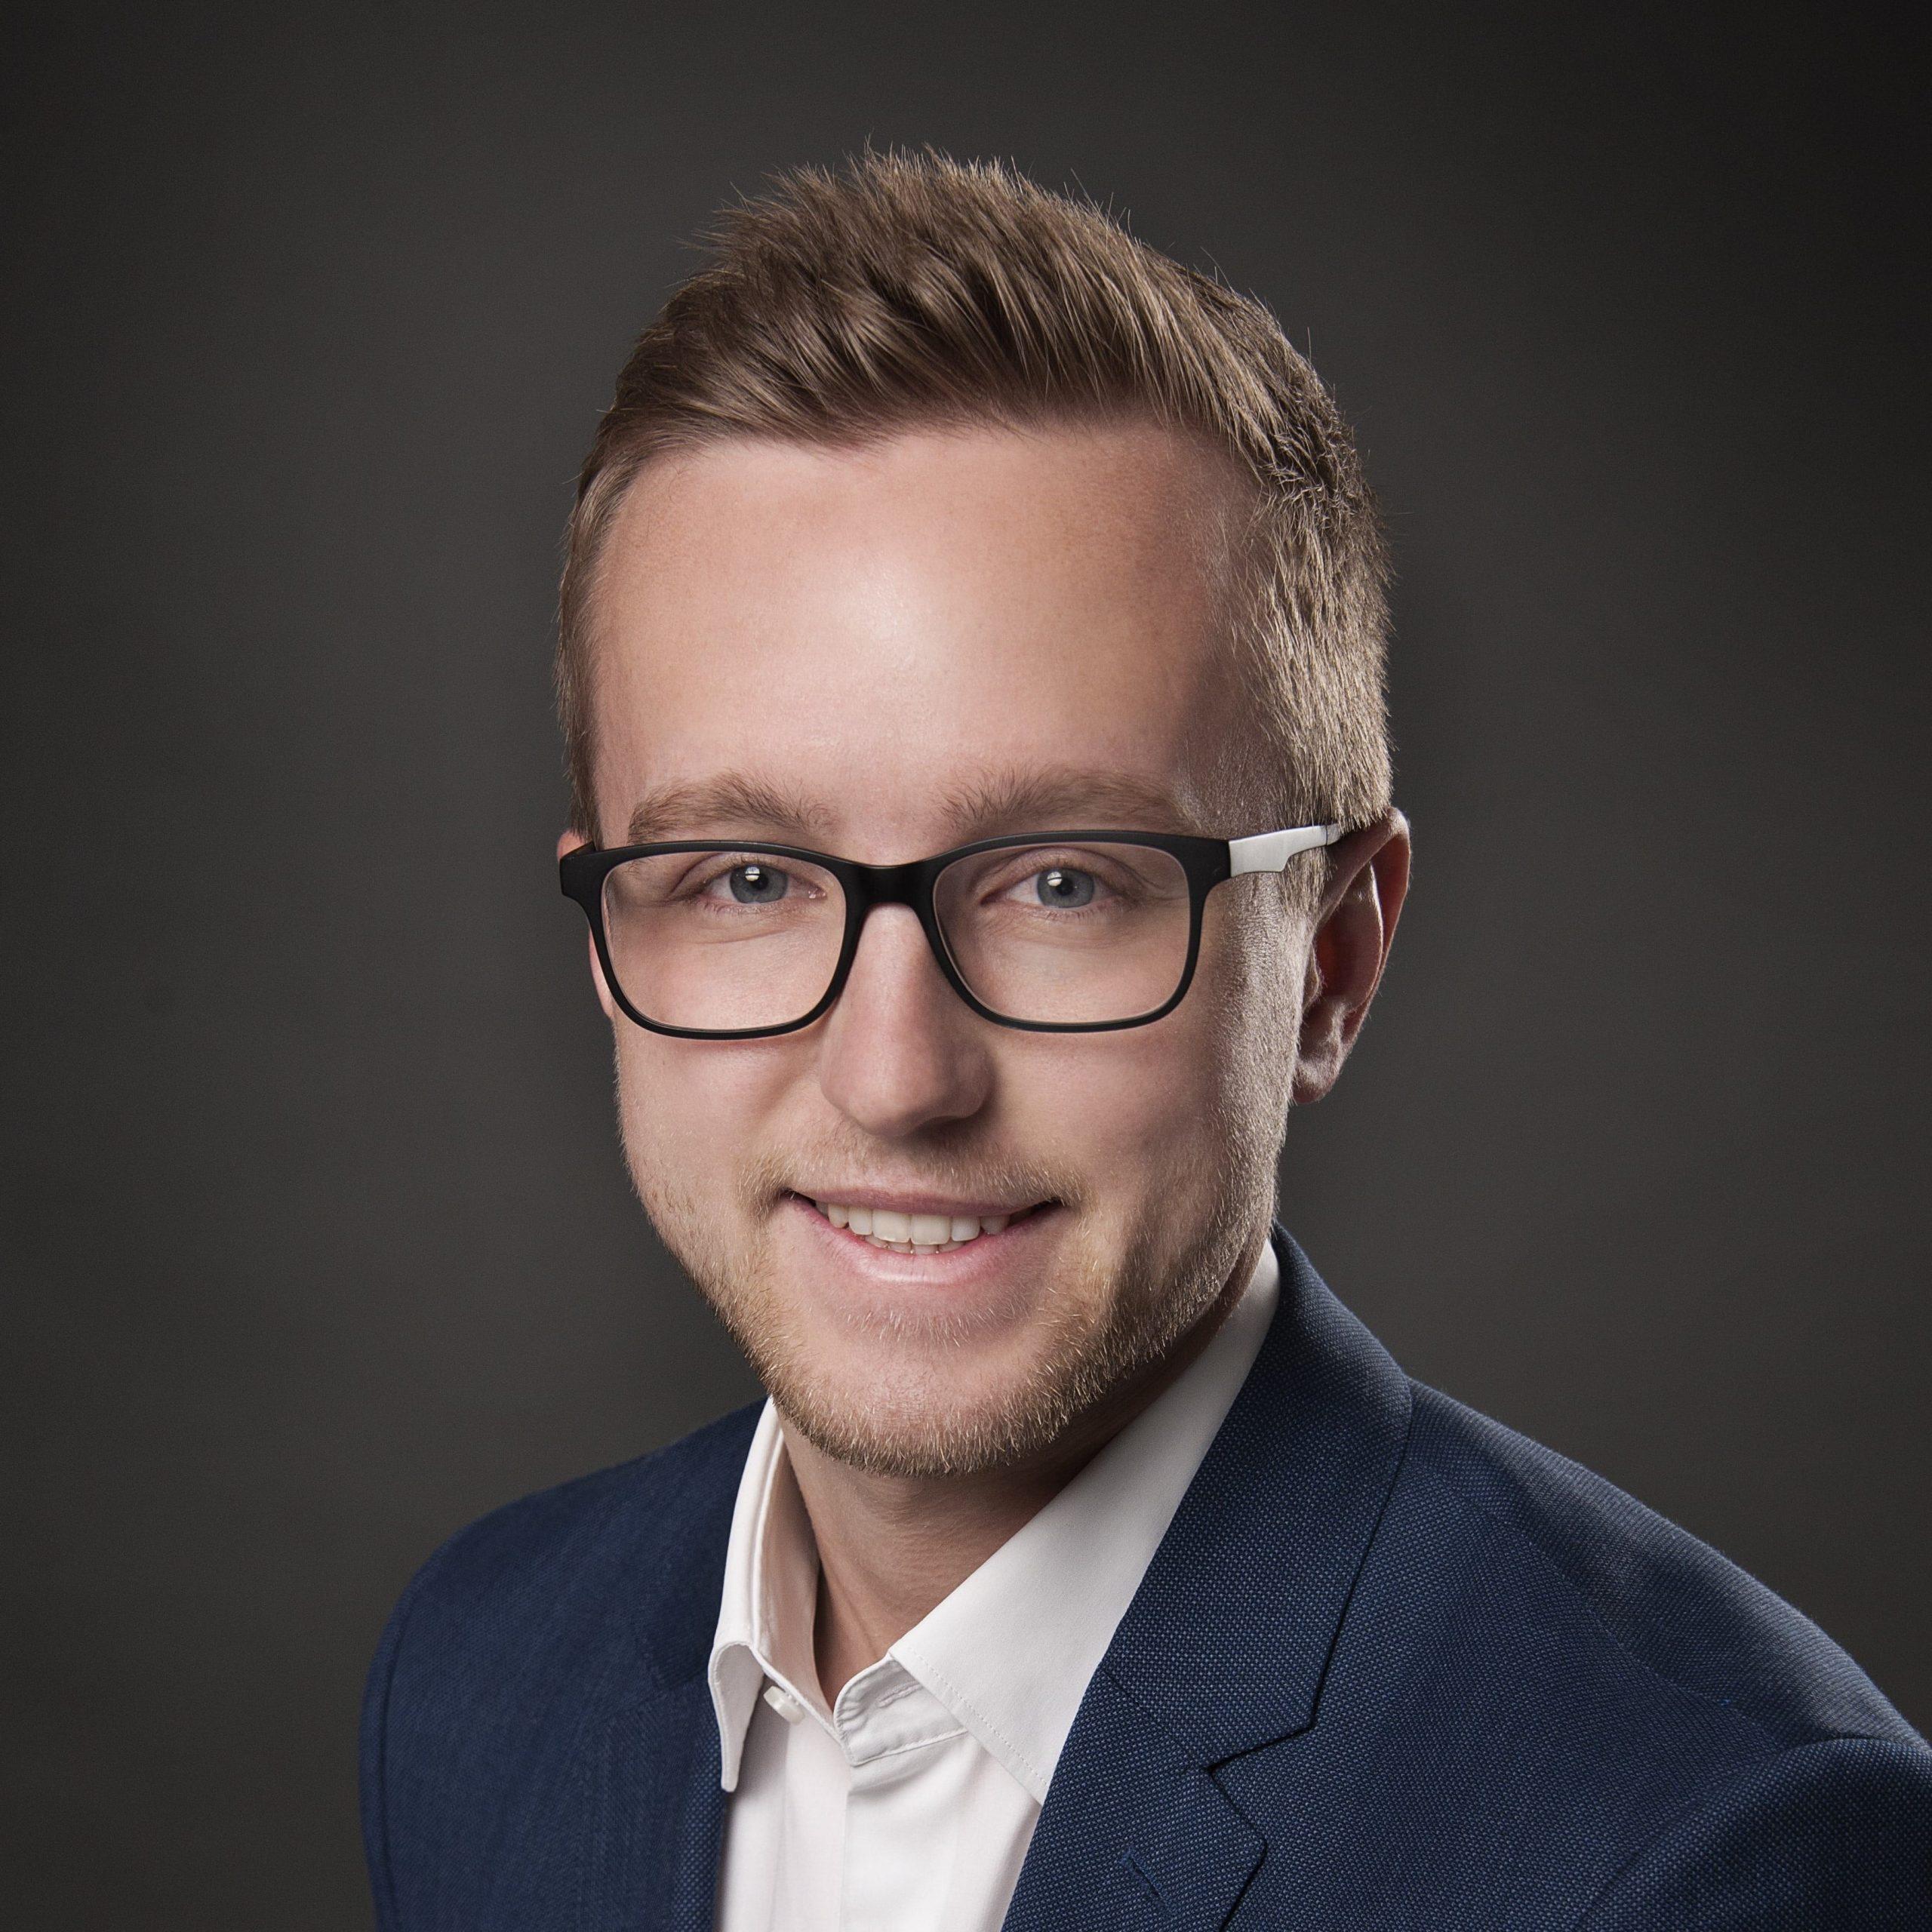 Mst. Alexander Schöffmann